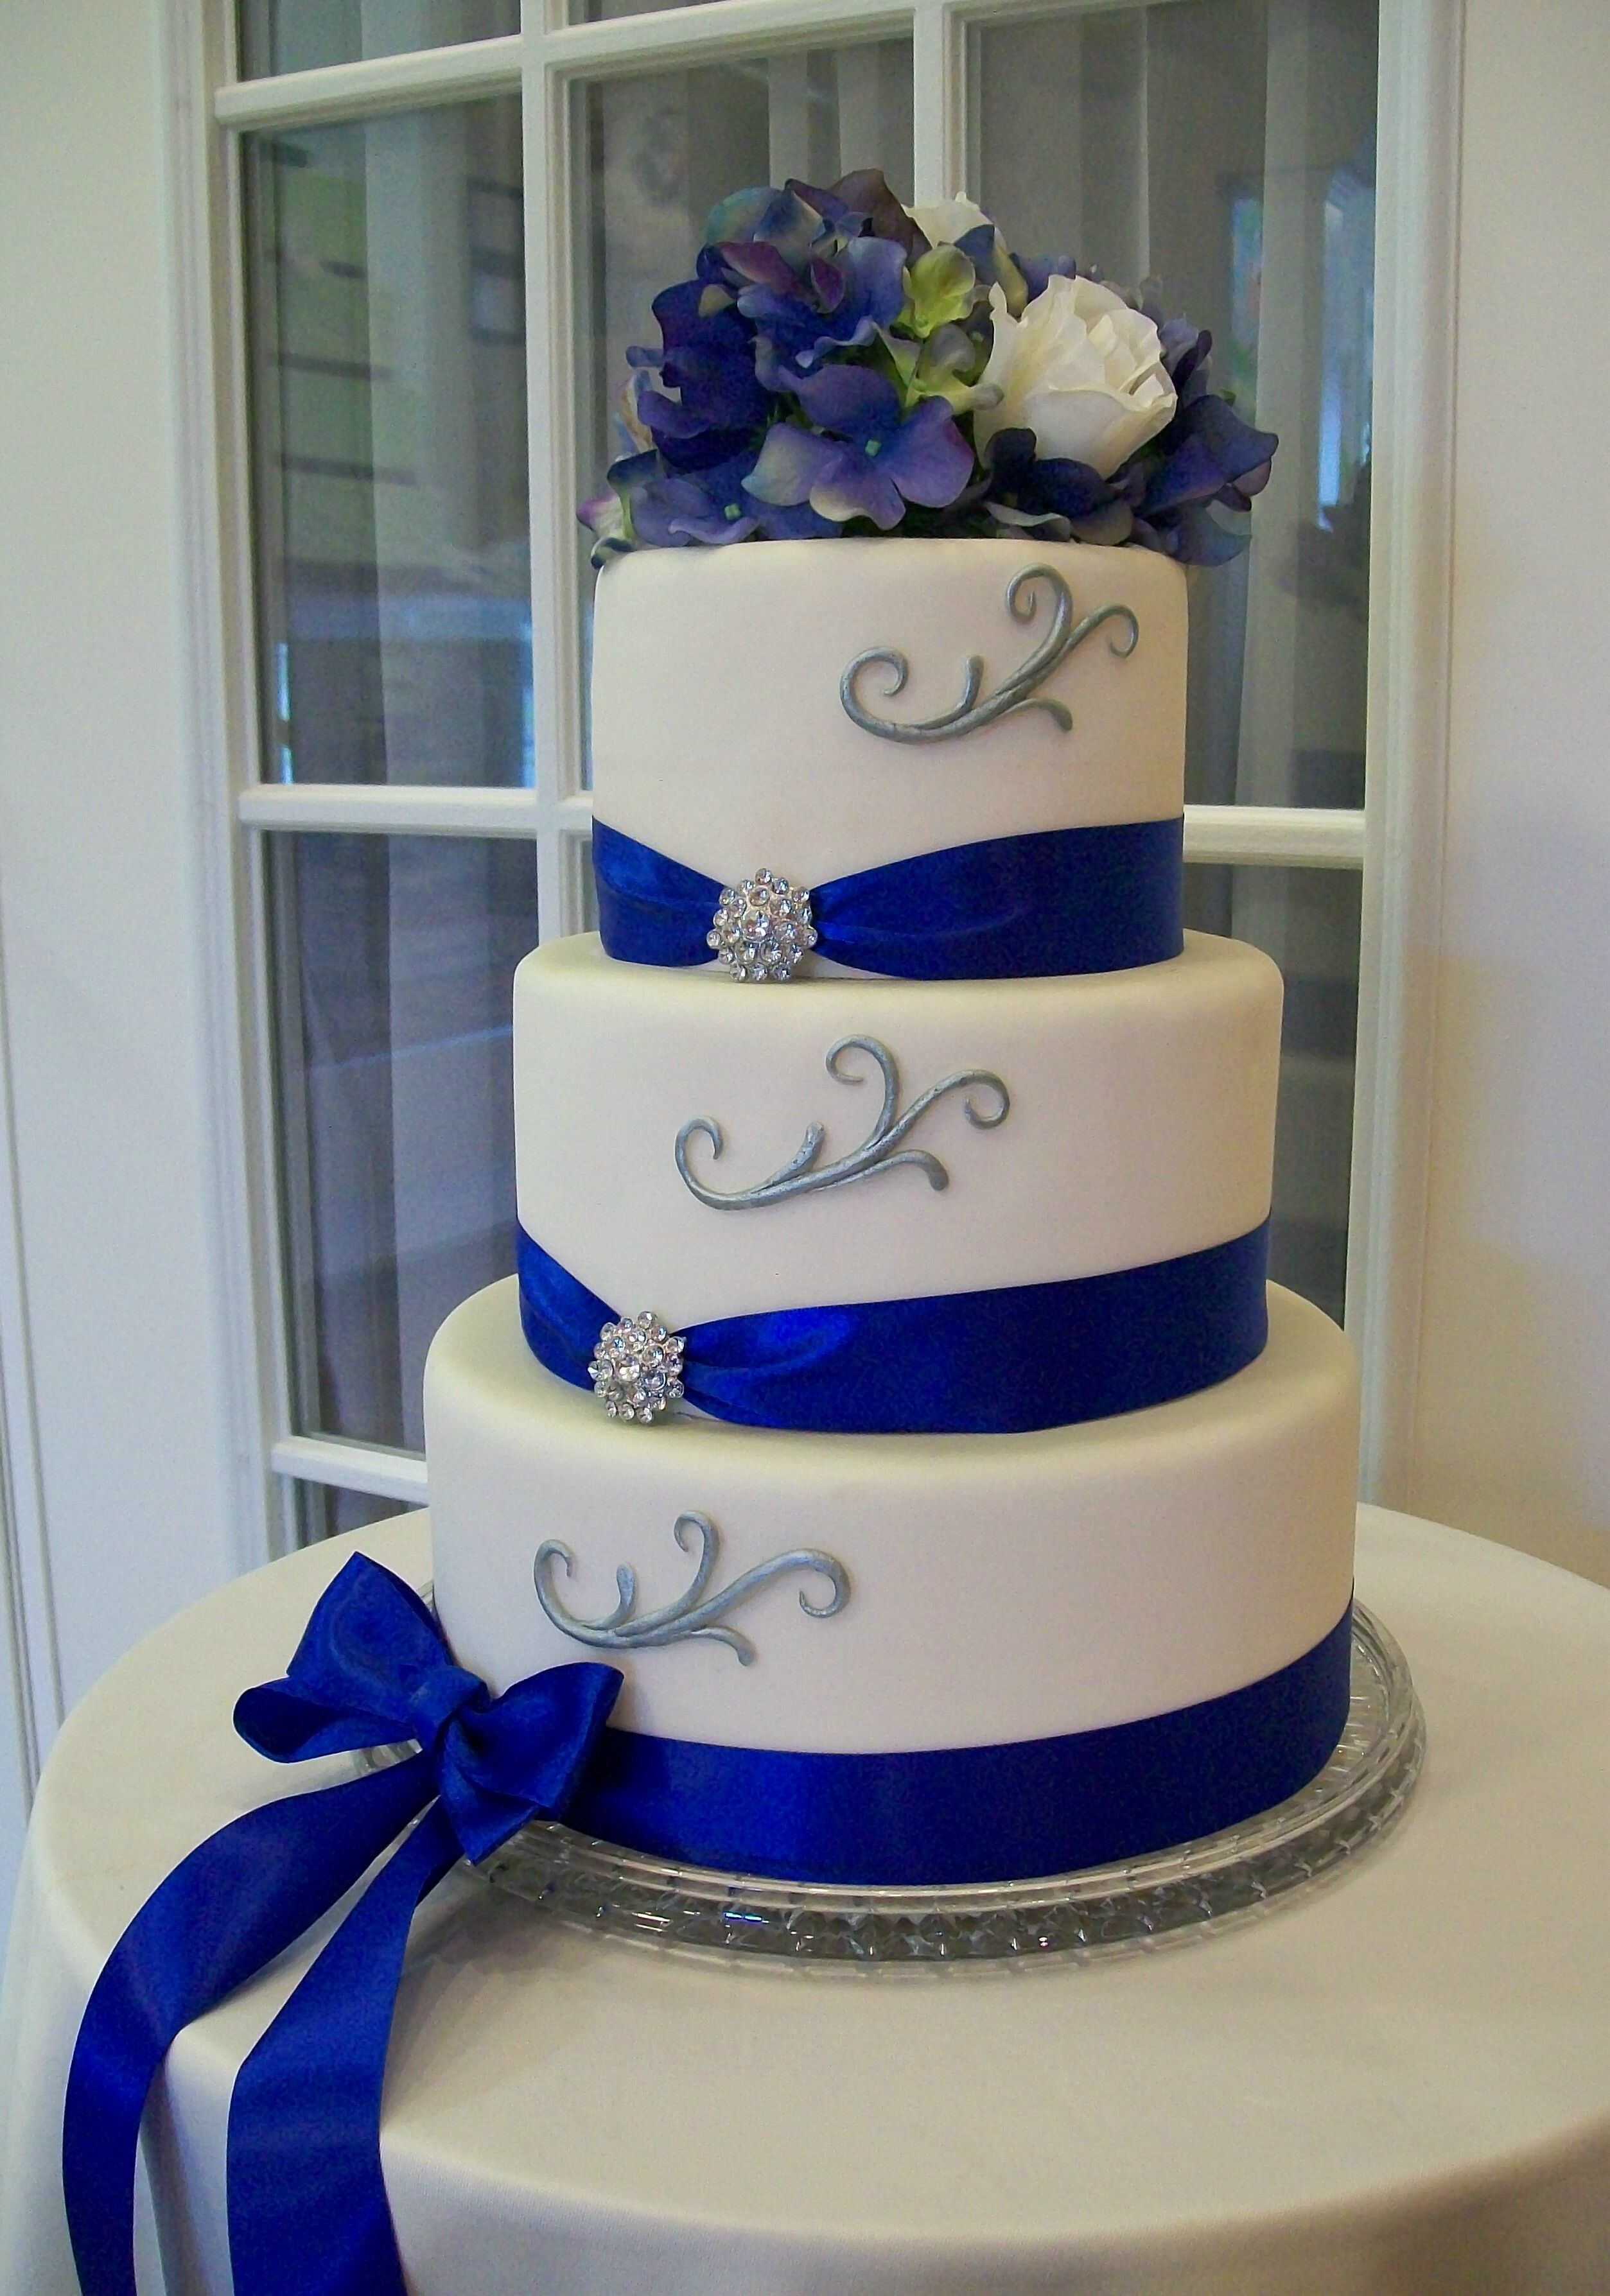 Pin By Tracy BolducGodbott On Wedding Cakes Pinterest Wedding - Small Blue Wedding Cakes